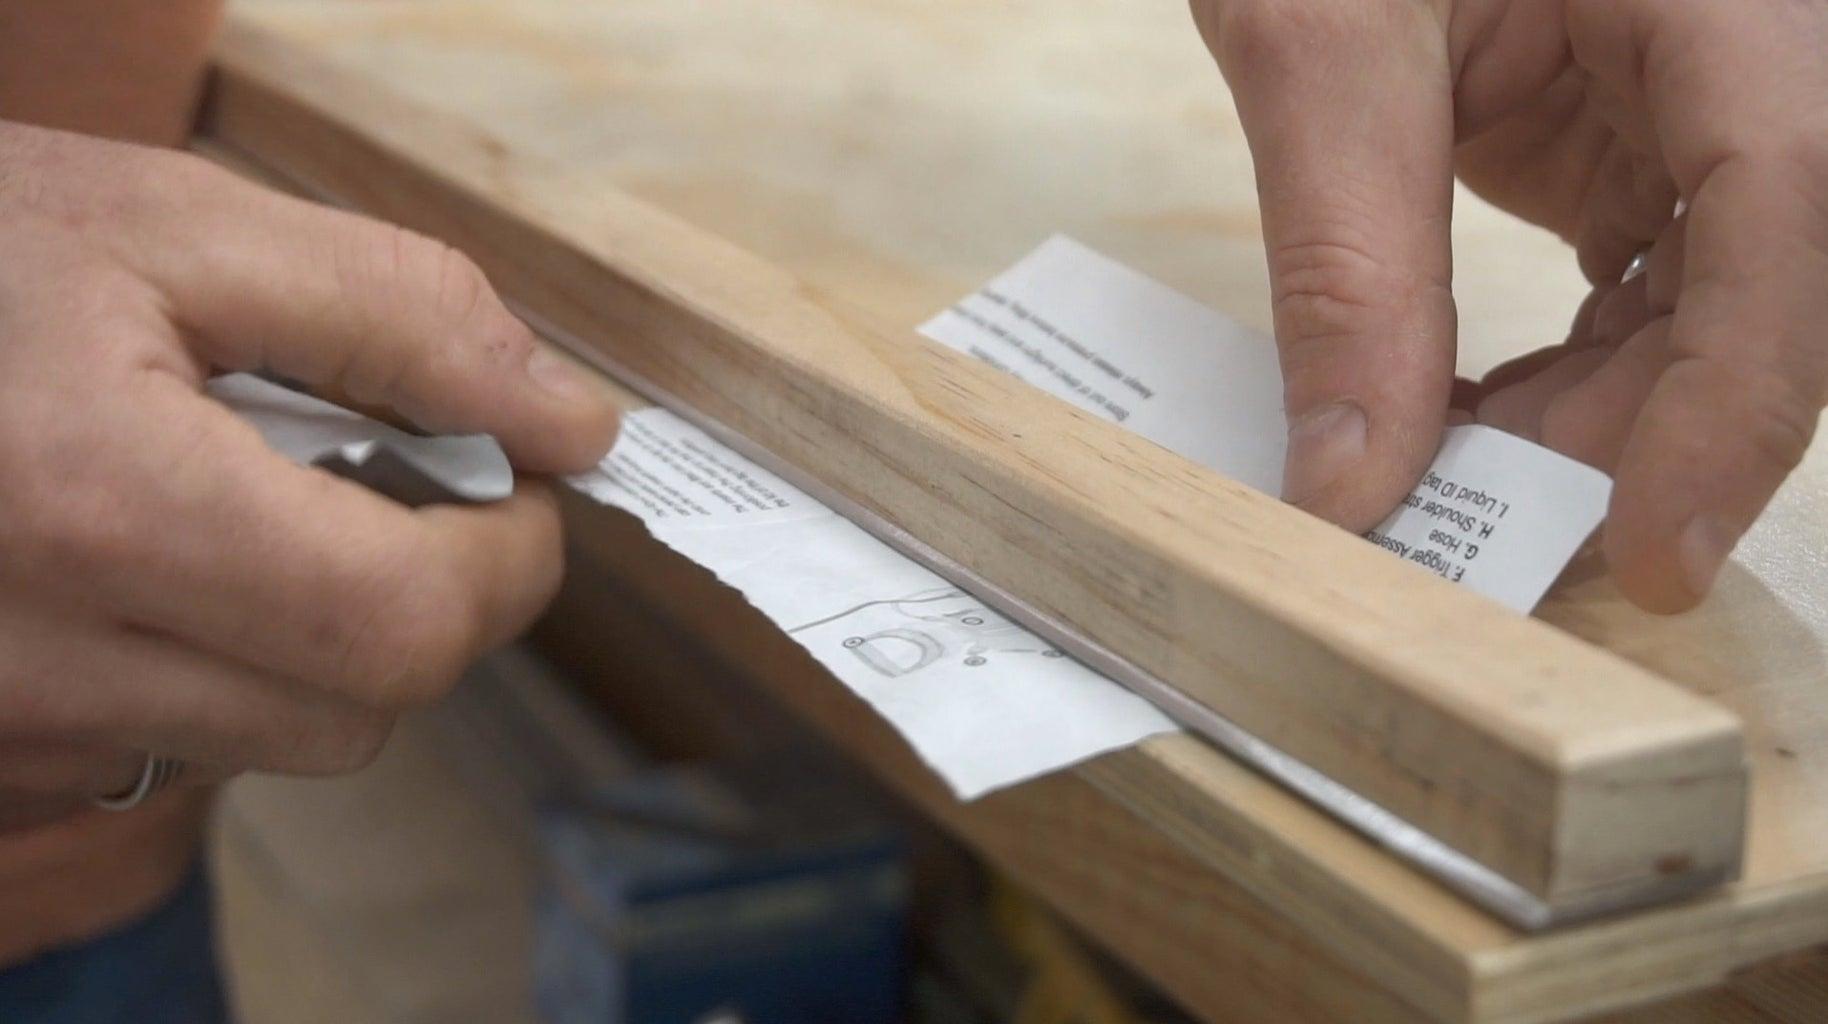 Create the Cutting Blade